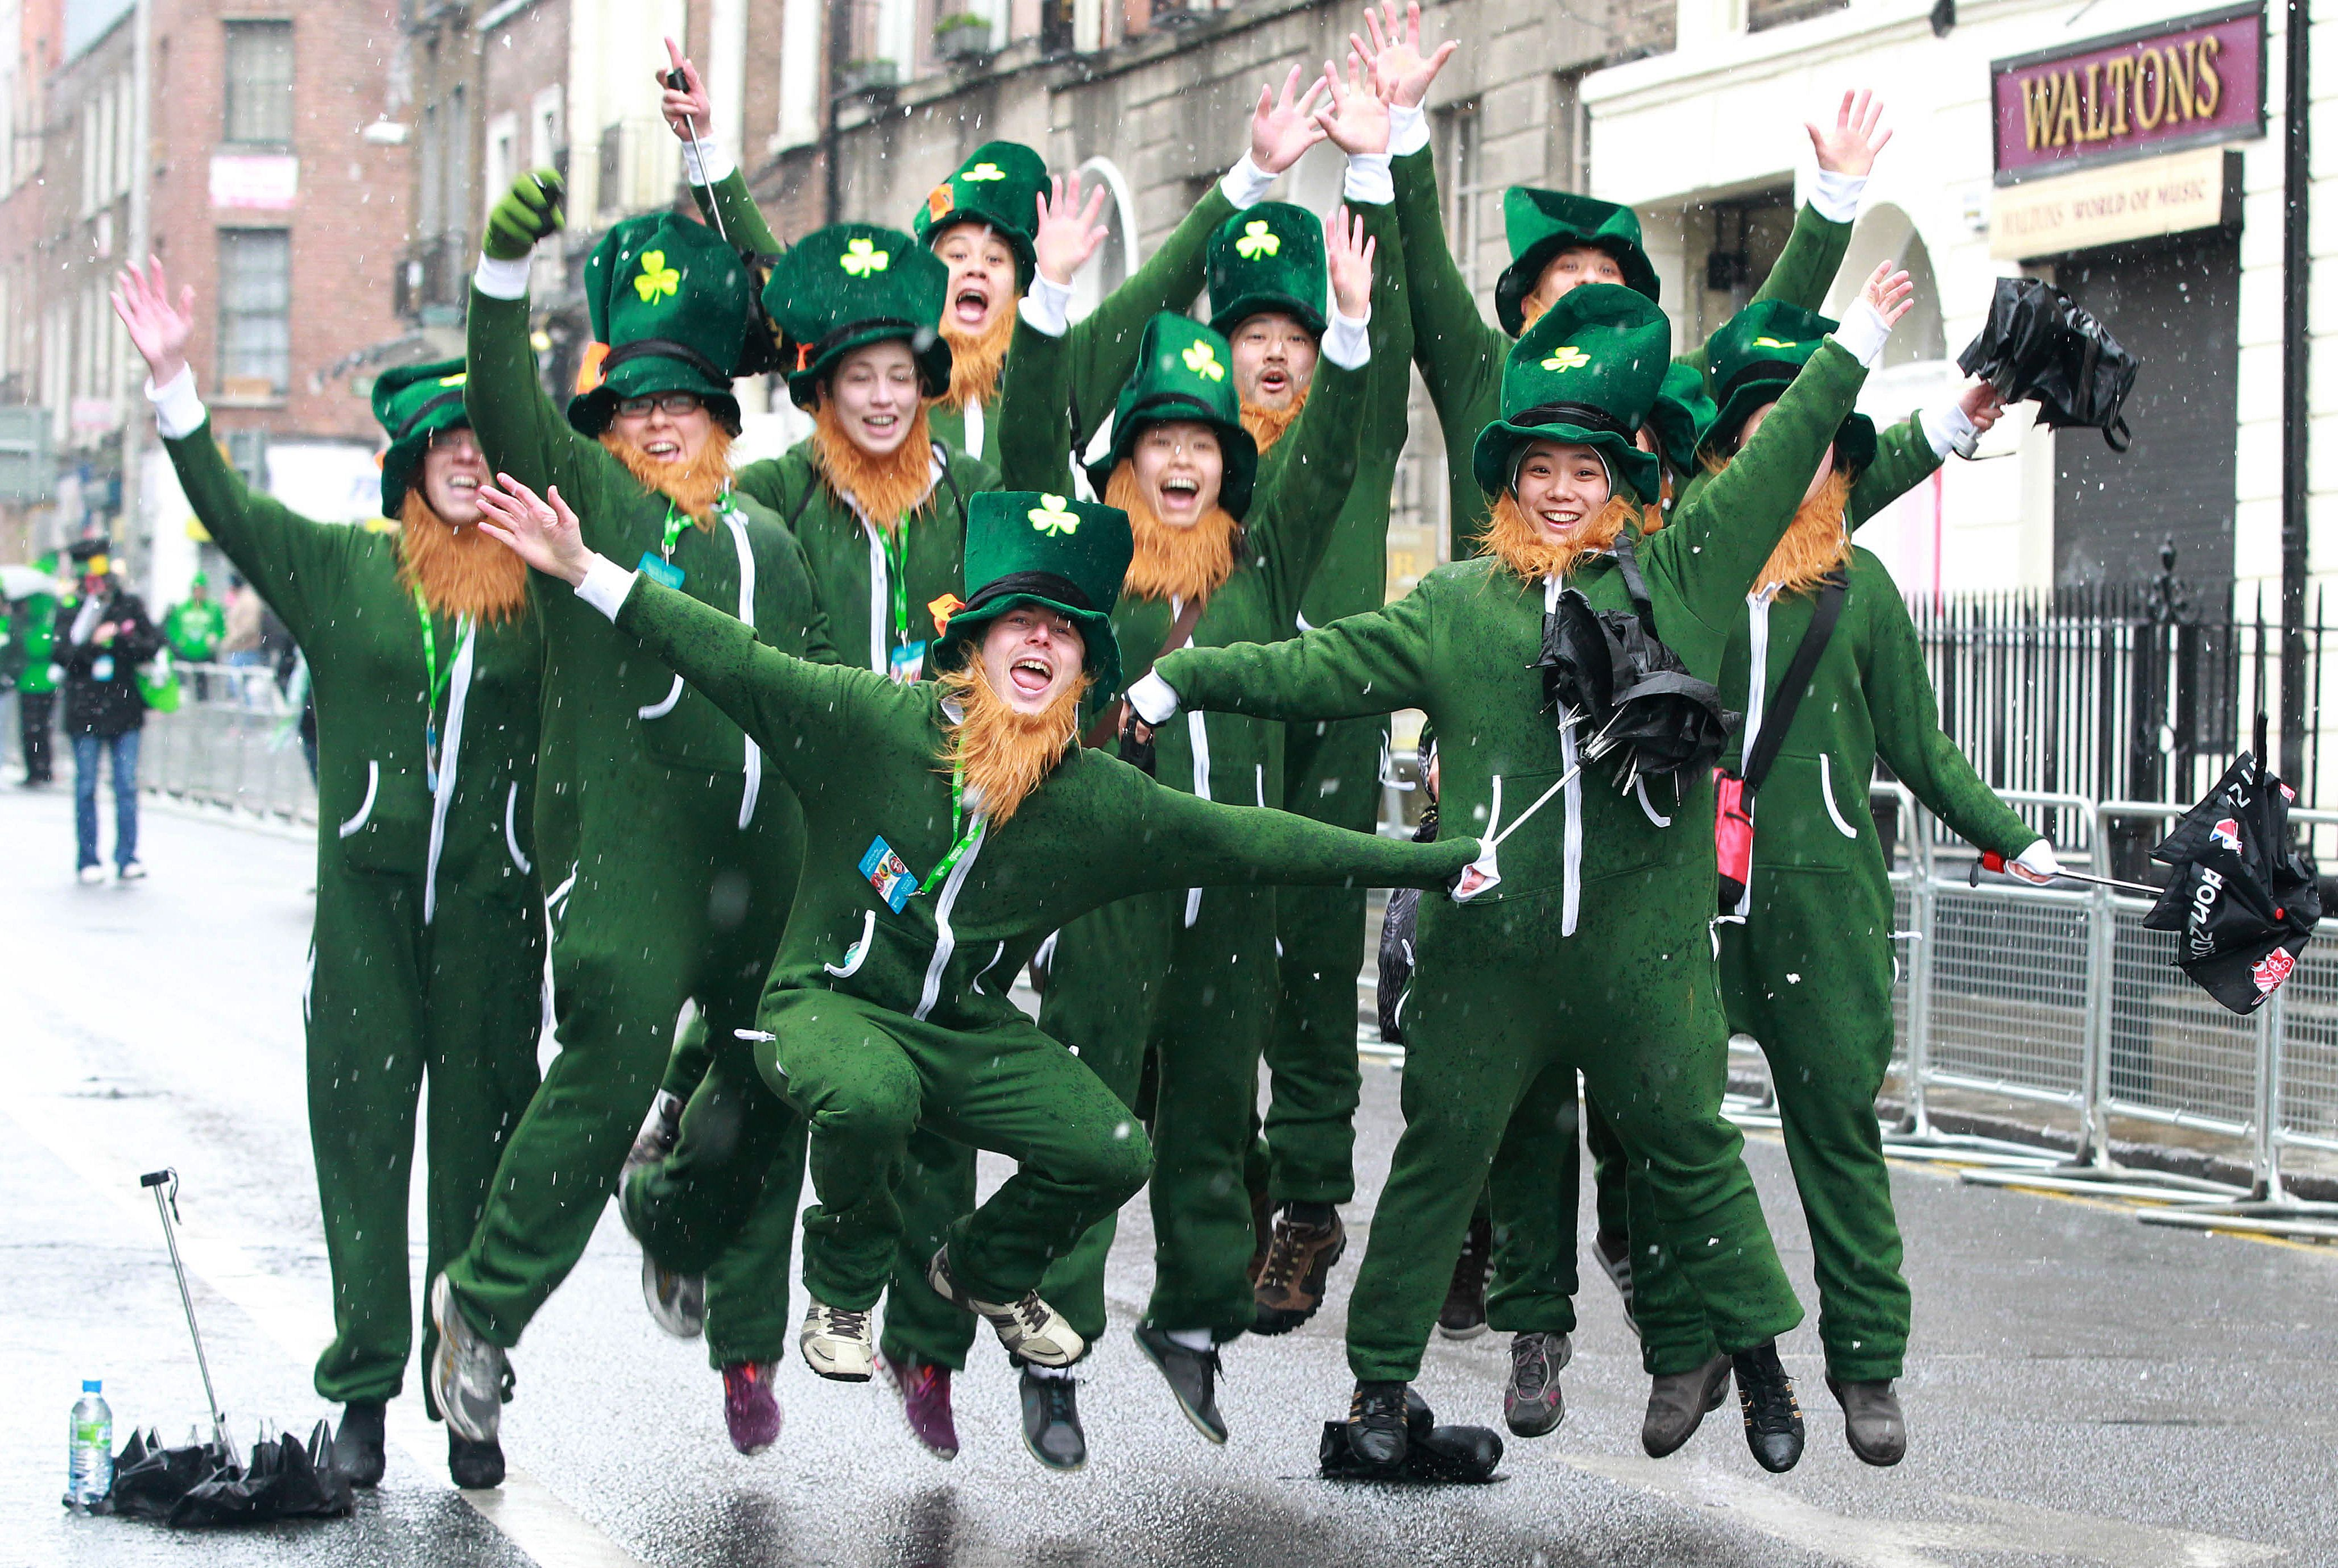 Disfraces para la fiesta de Saint Patrick's Day